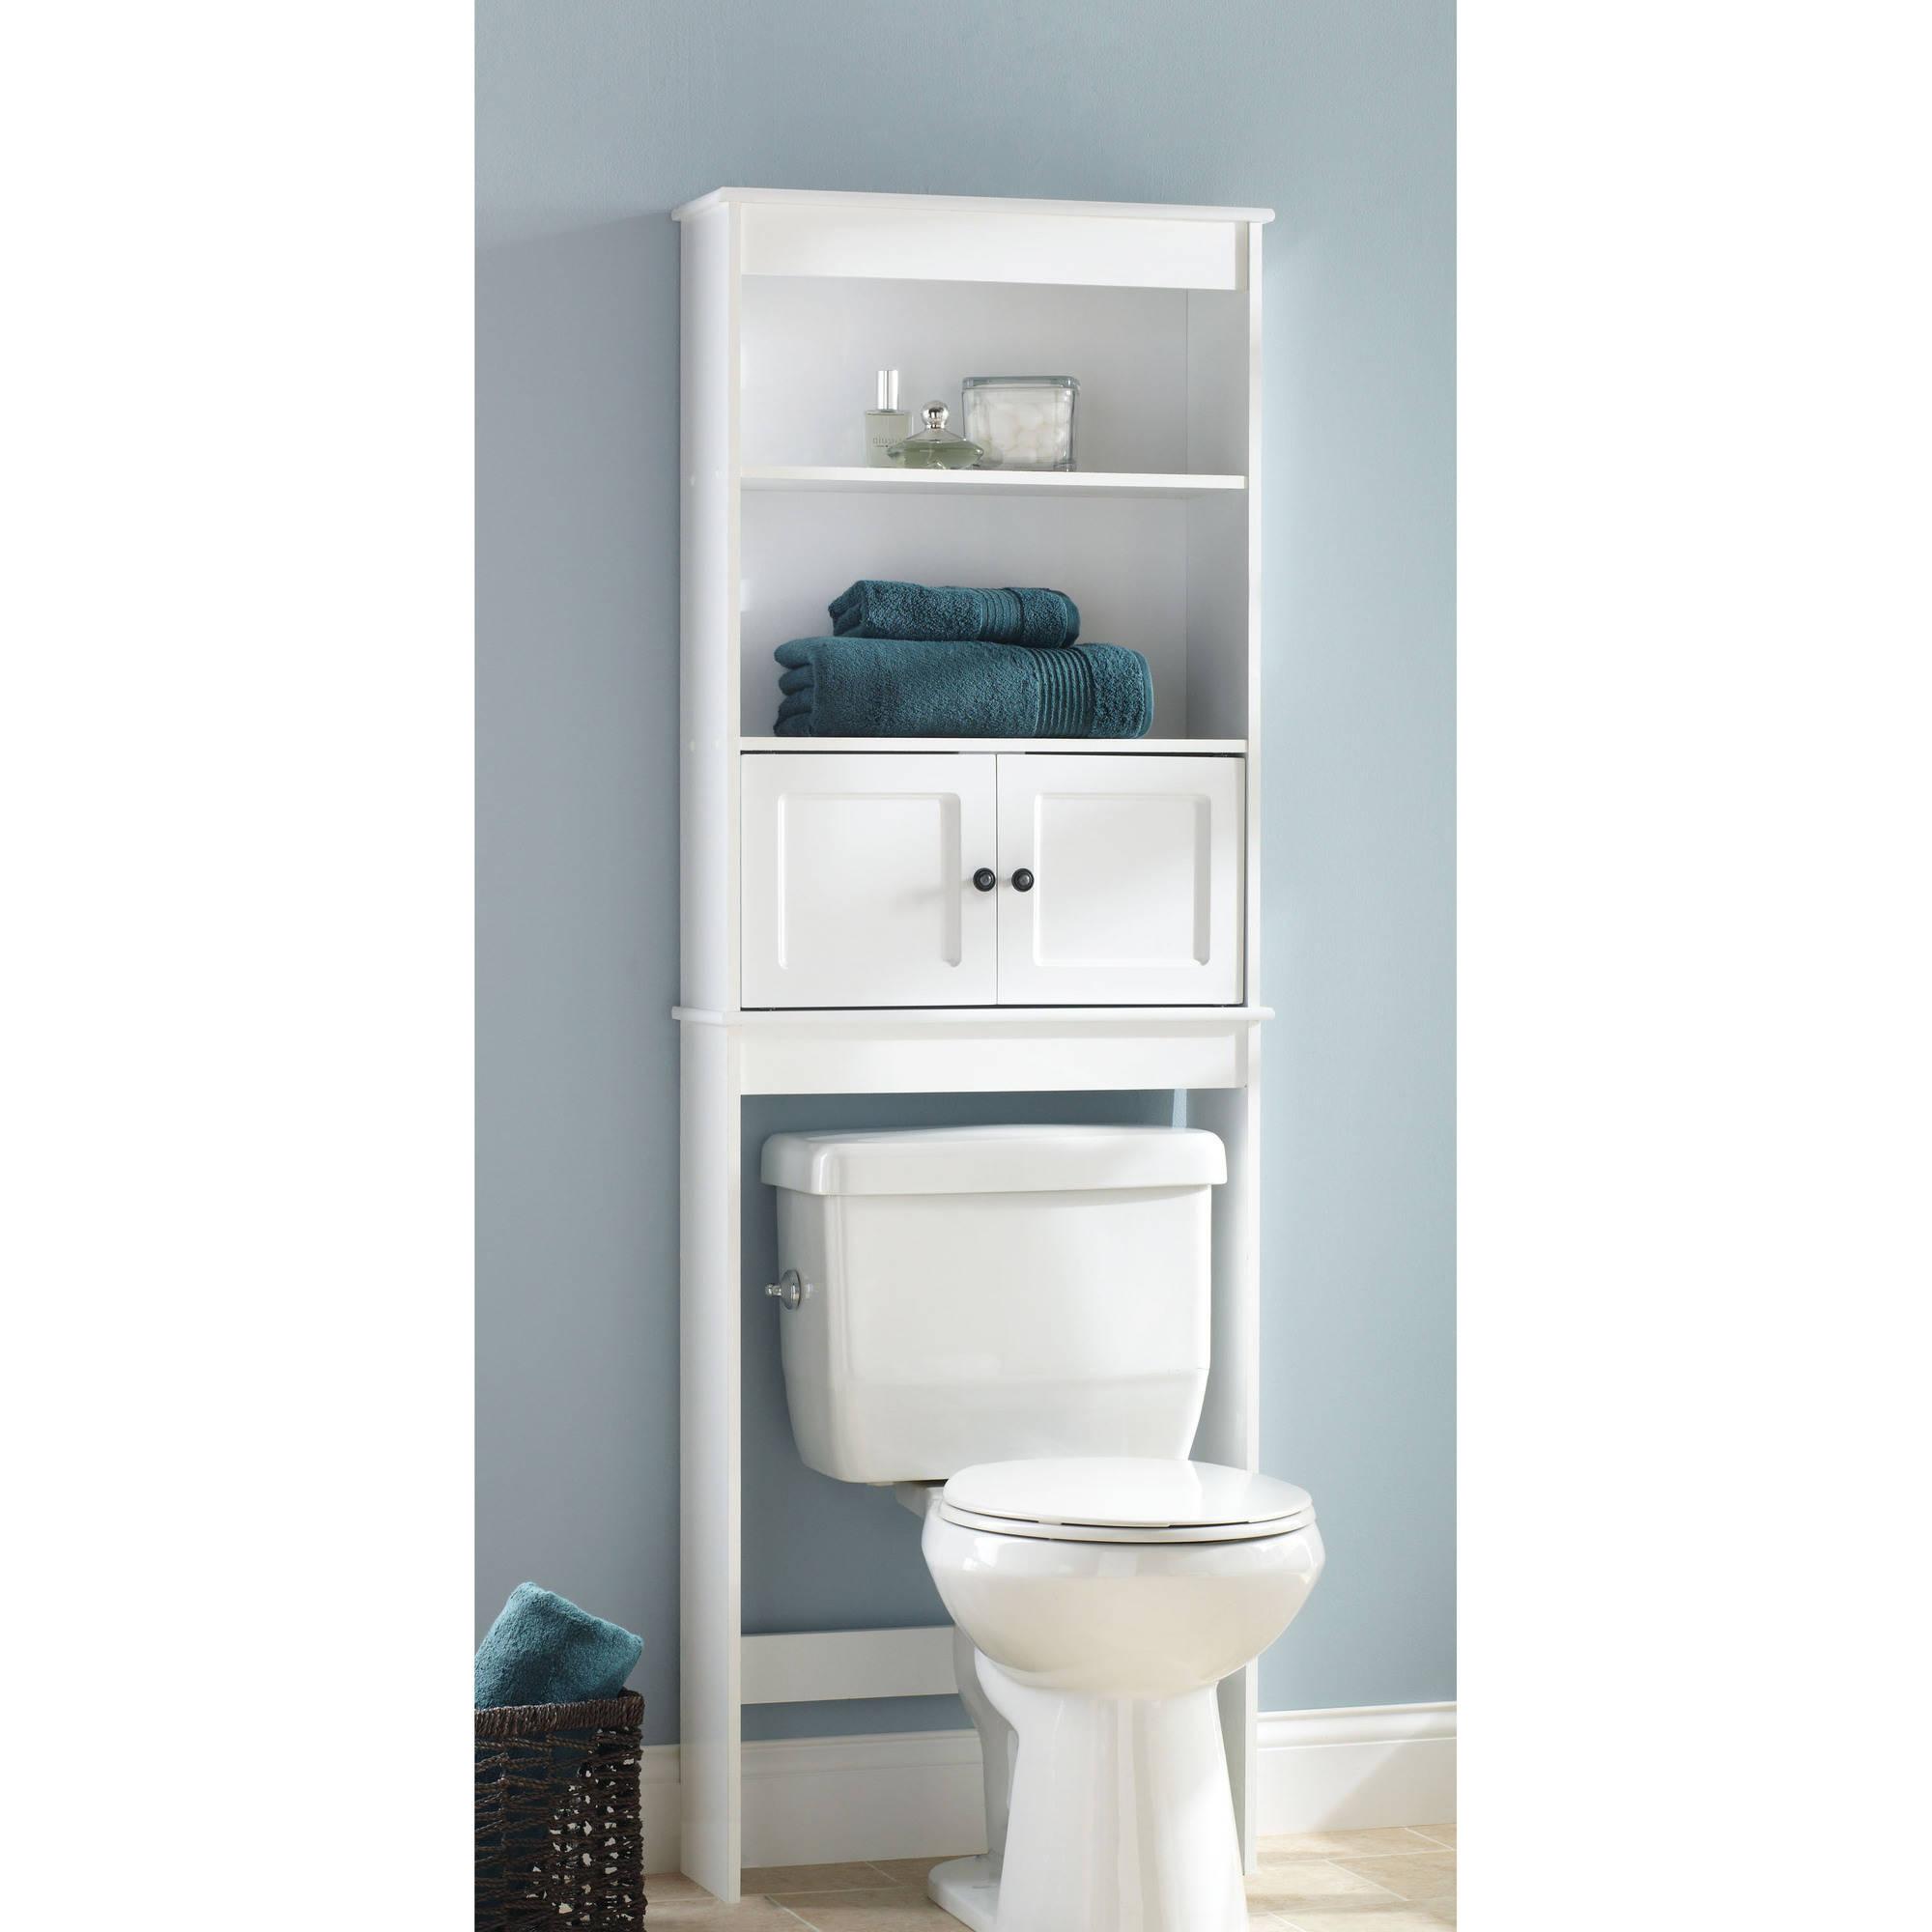 bathroom space saver hawthorne place white wood spacesaver bathroom shelf - walmart.com TSWLREK